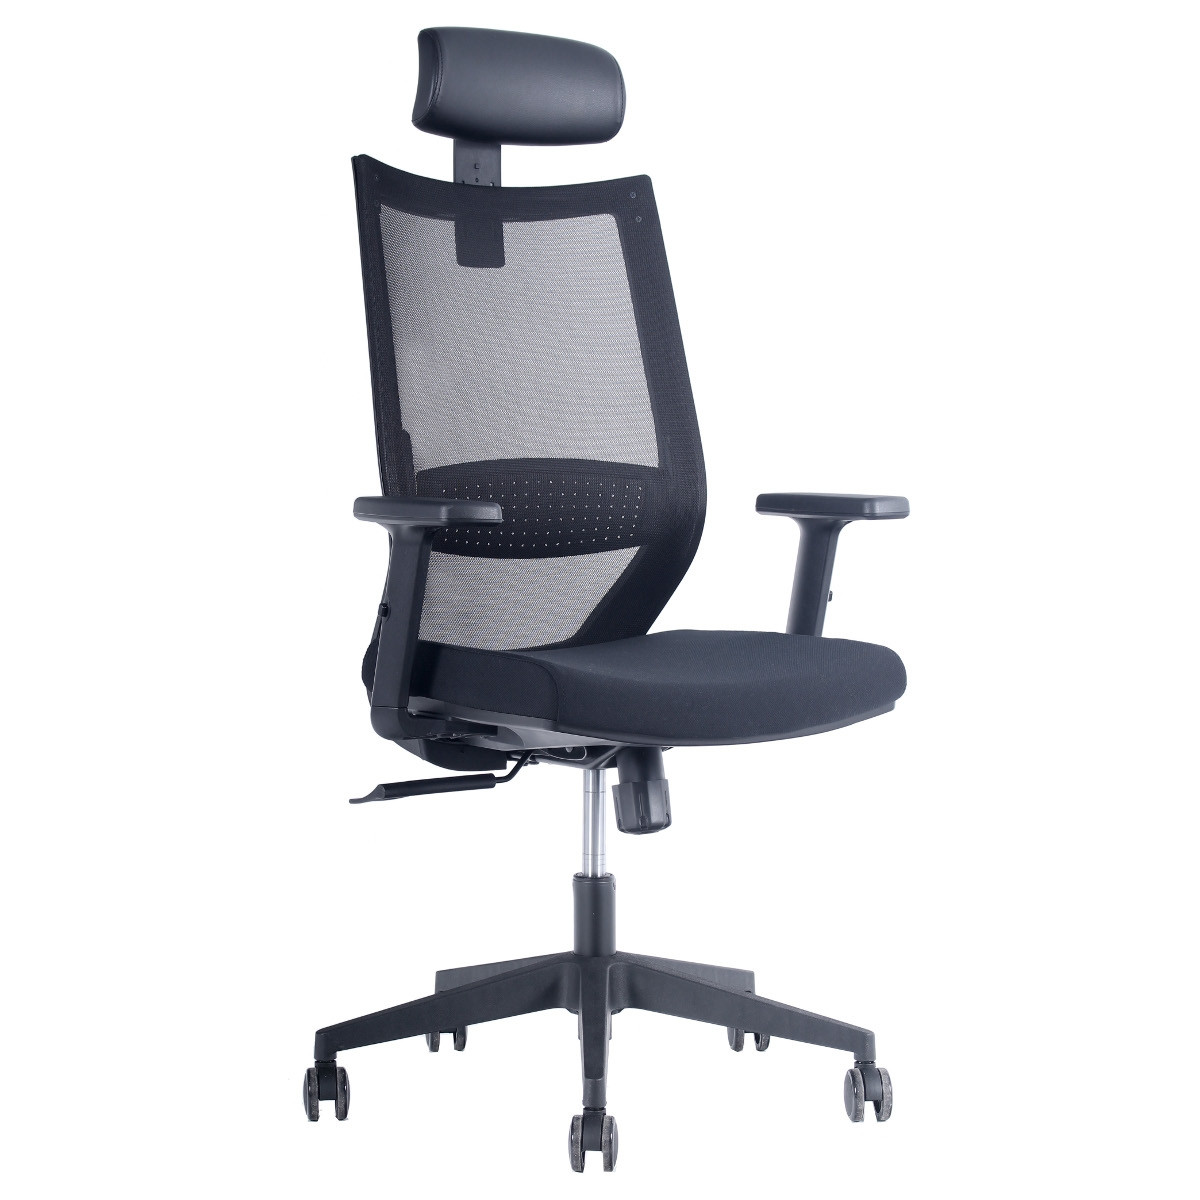 Sillas de escritorio ergonómica con cabecero